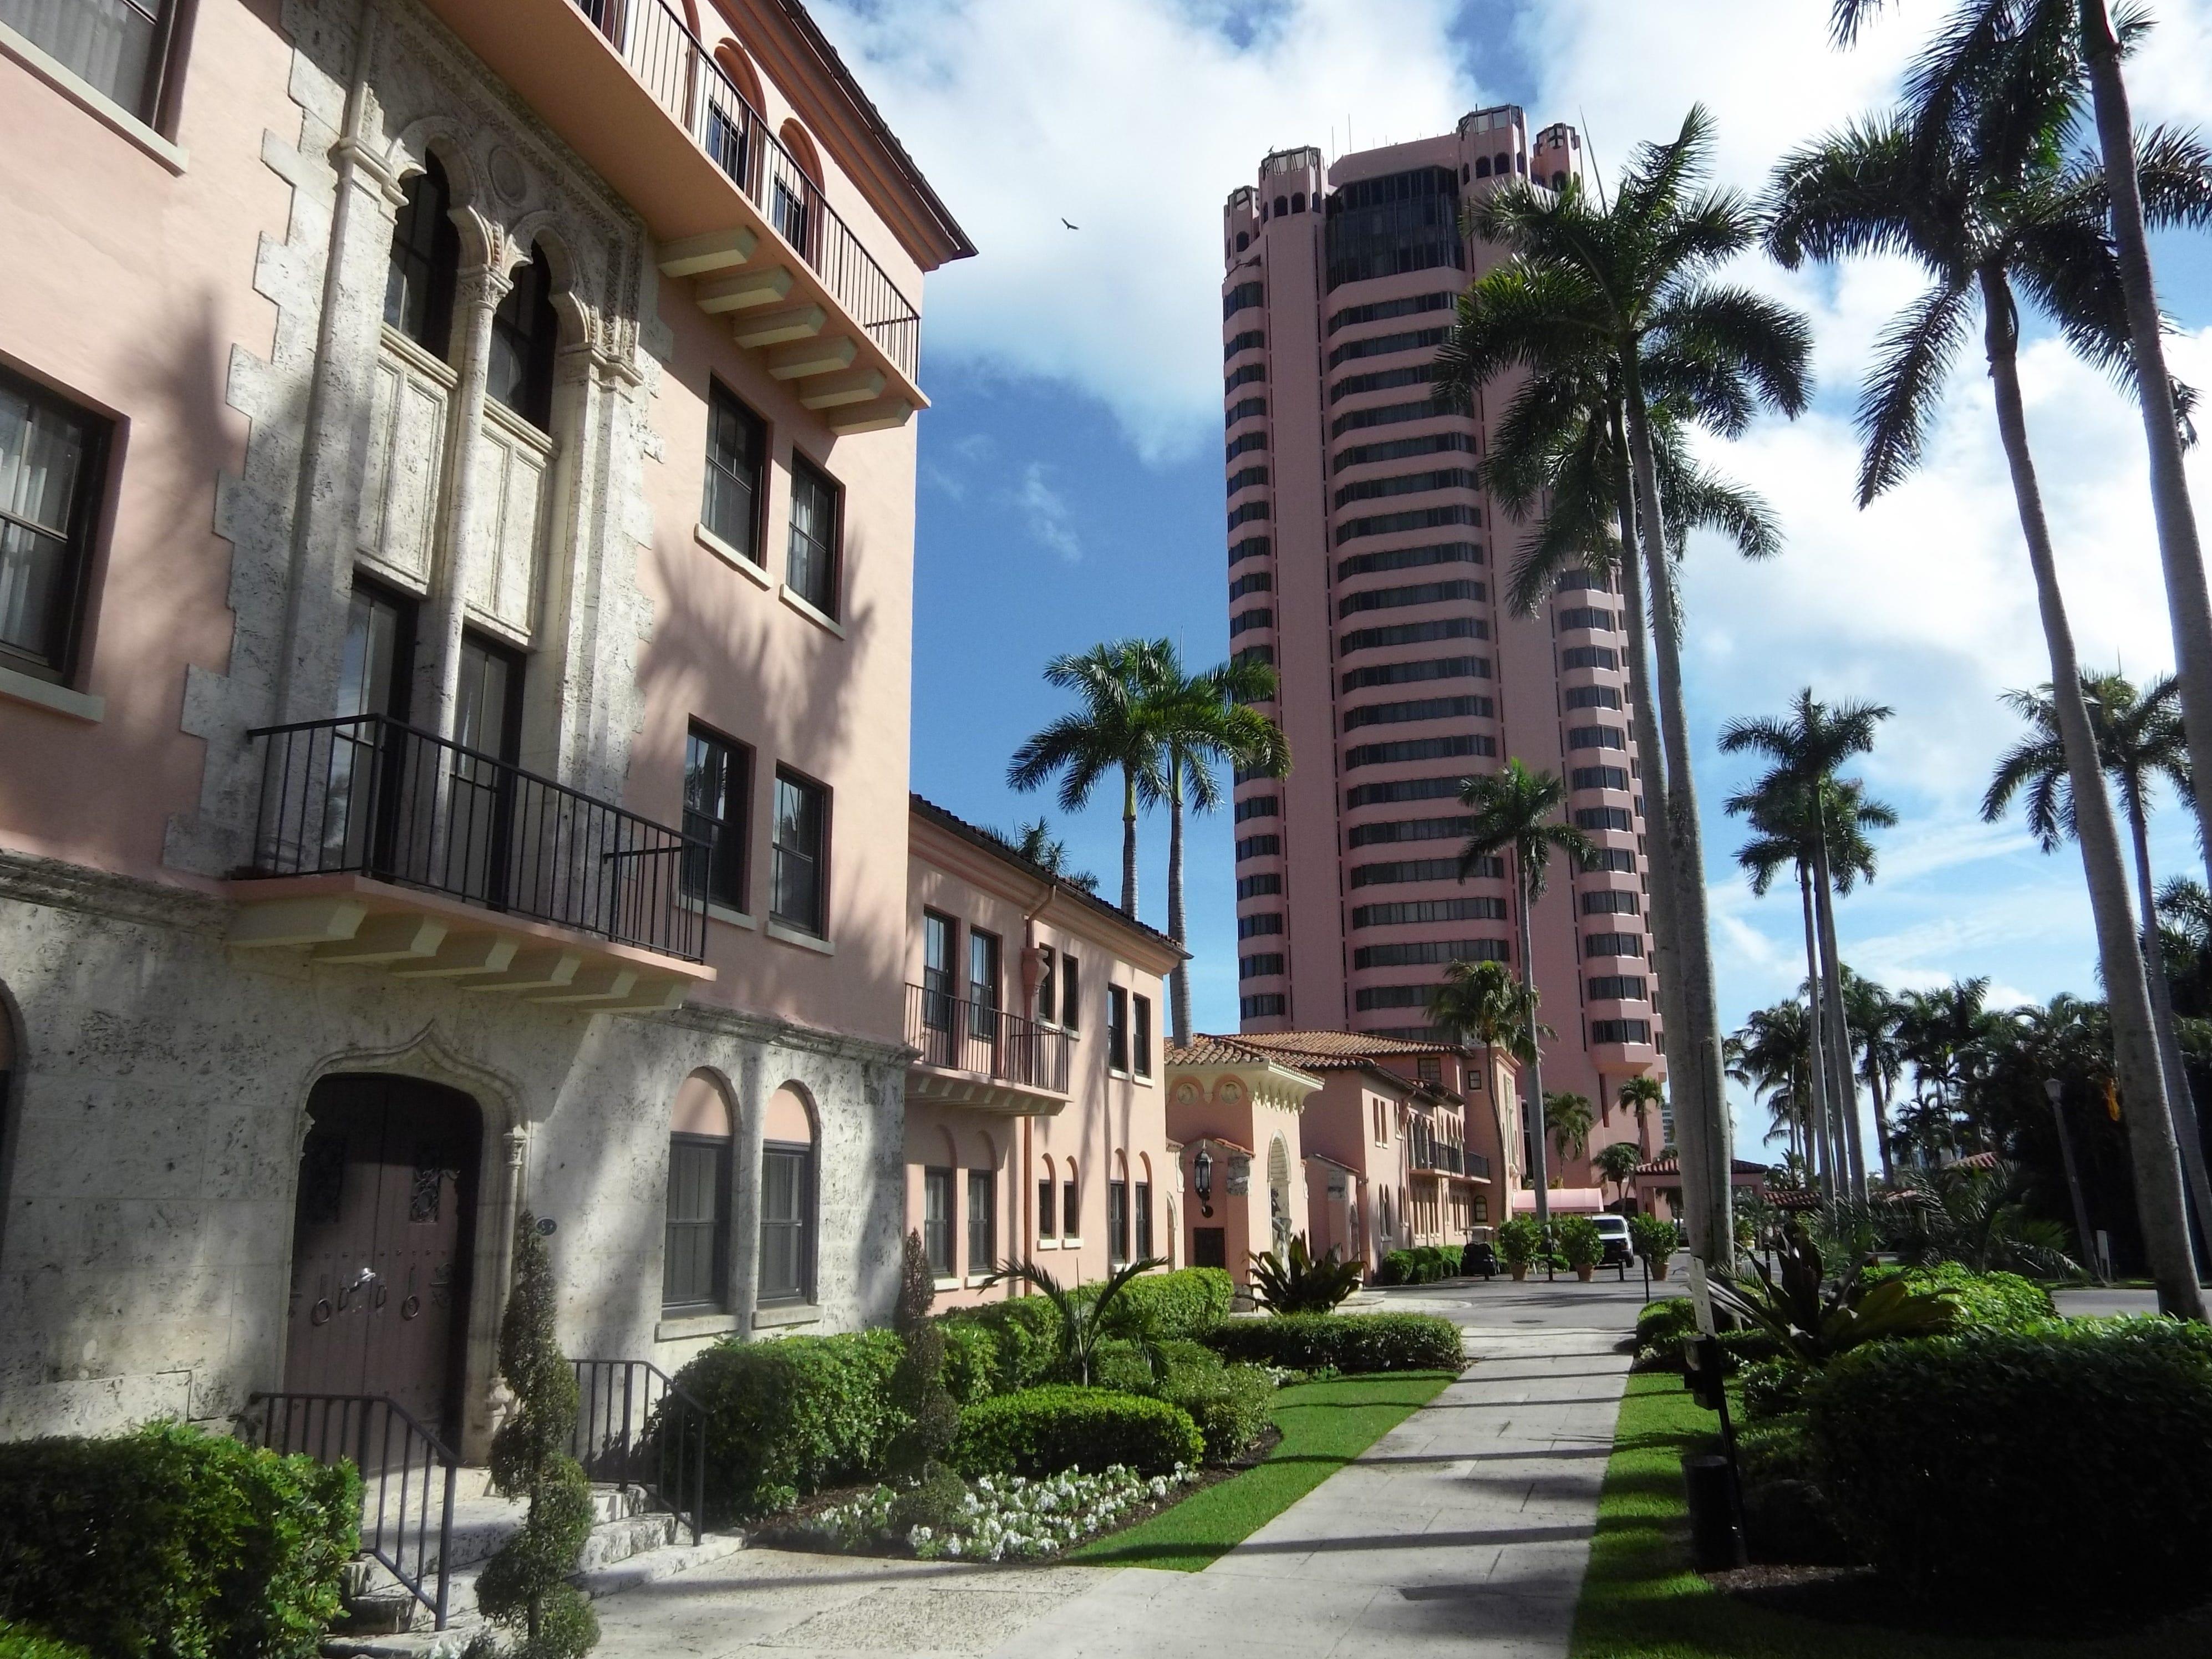 The Tower sits beyond the original  Cloister Inn at Boca Raton Resort & Club.